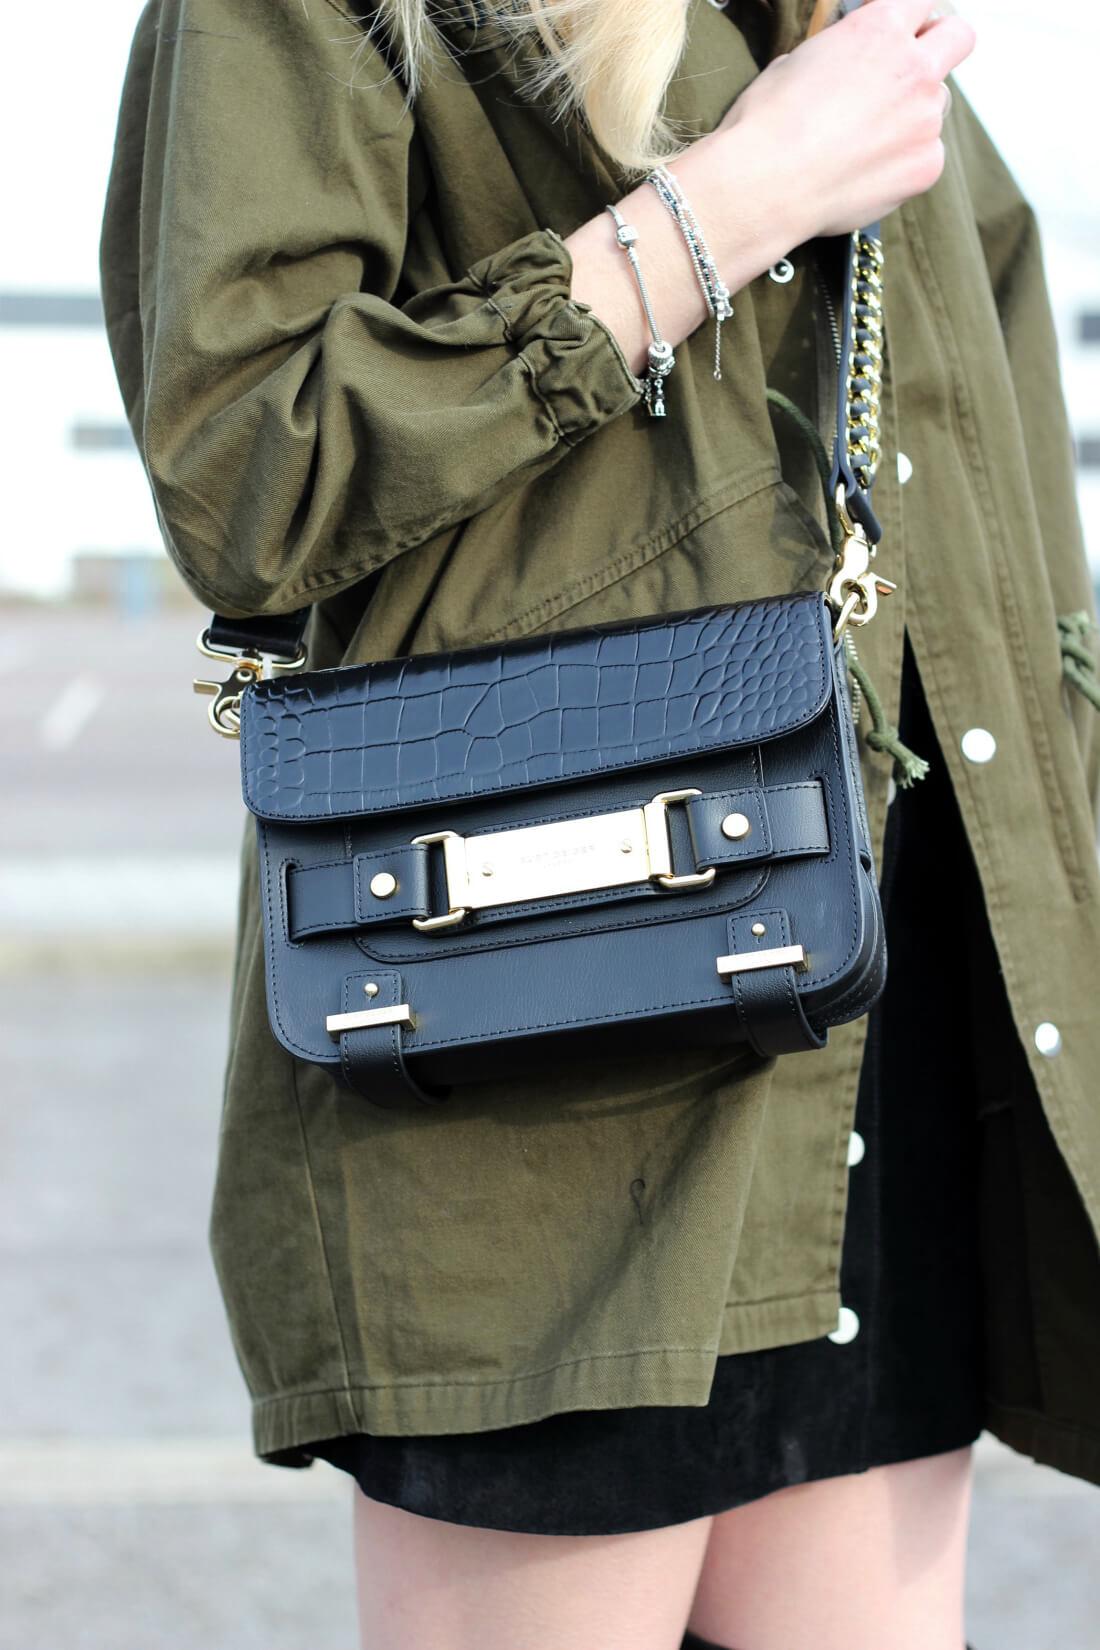 Best across body fashionable bags - Kurt Geiger London Charlie